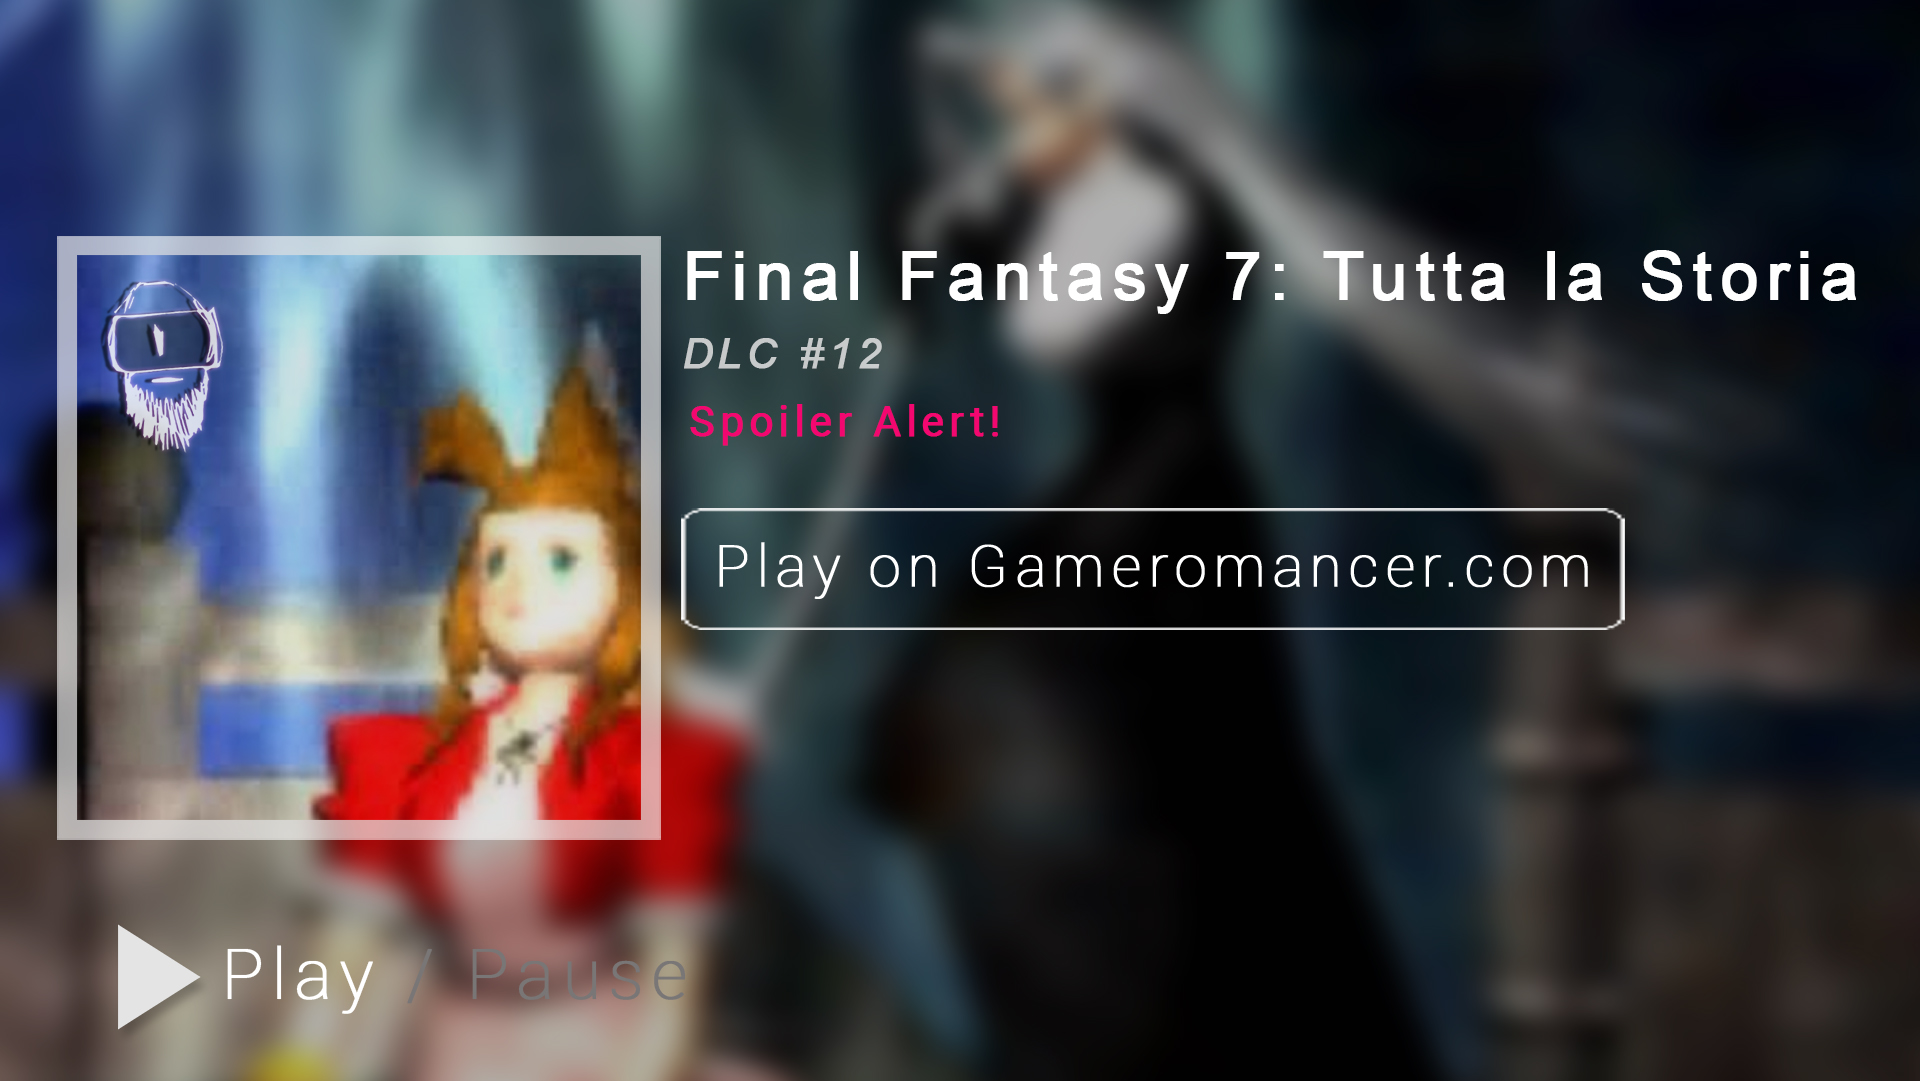 DLC #12: Final Fantasy VII, tutta la Storia